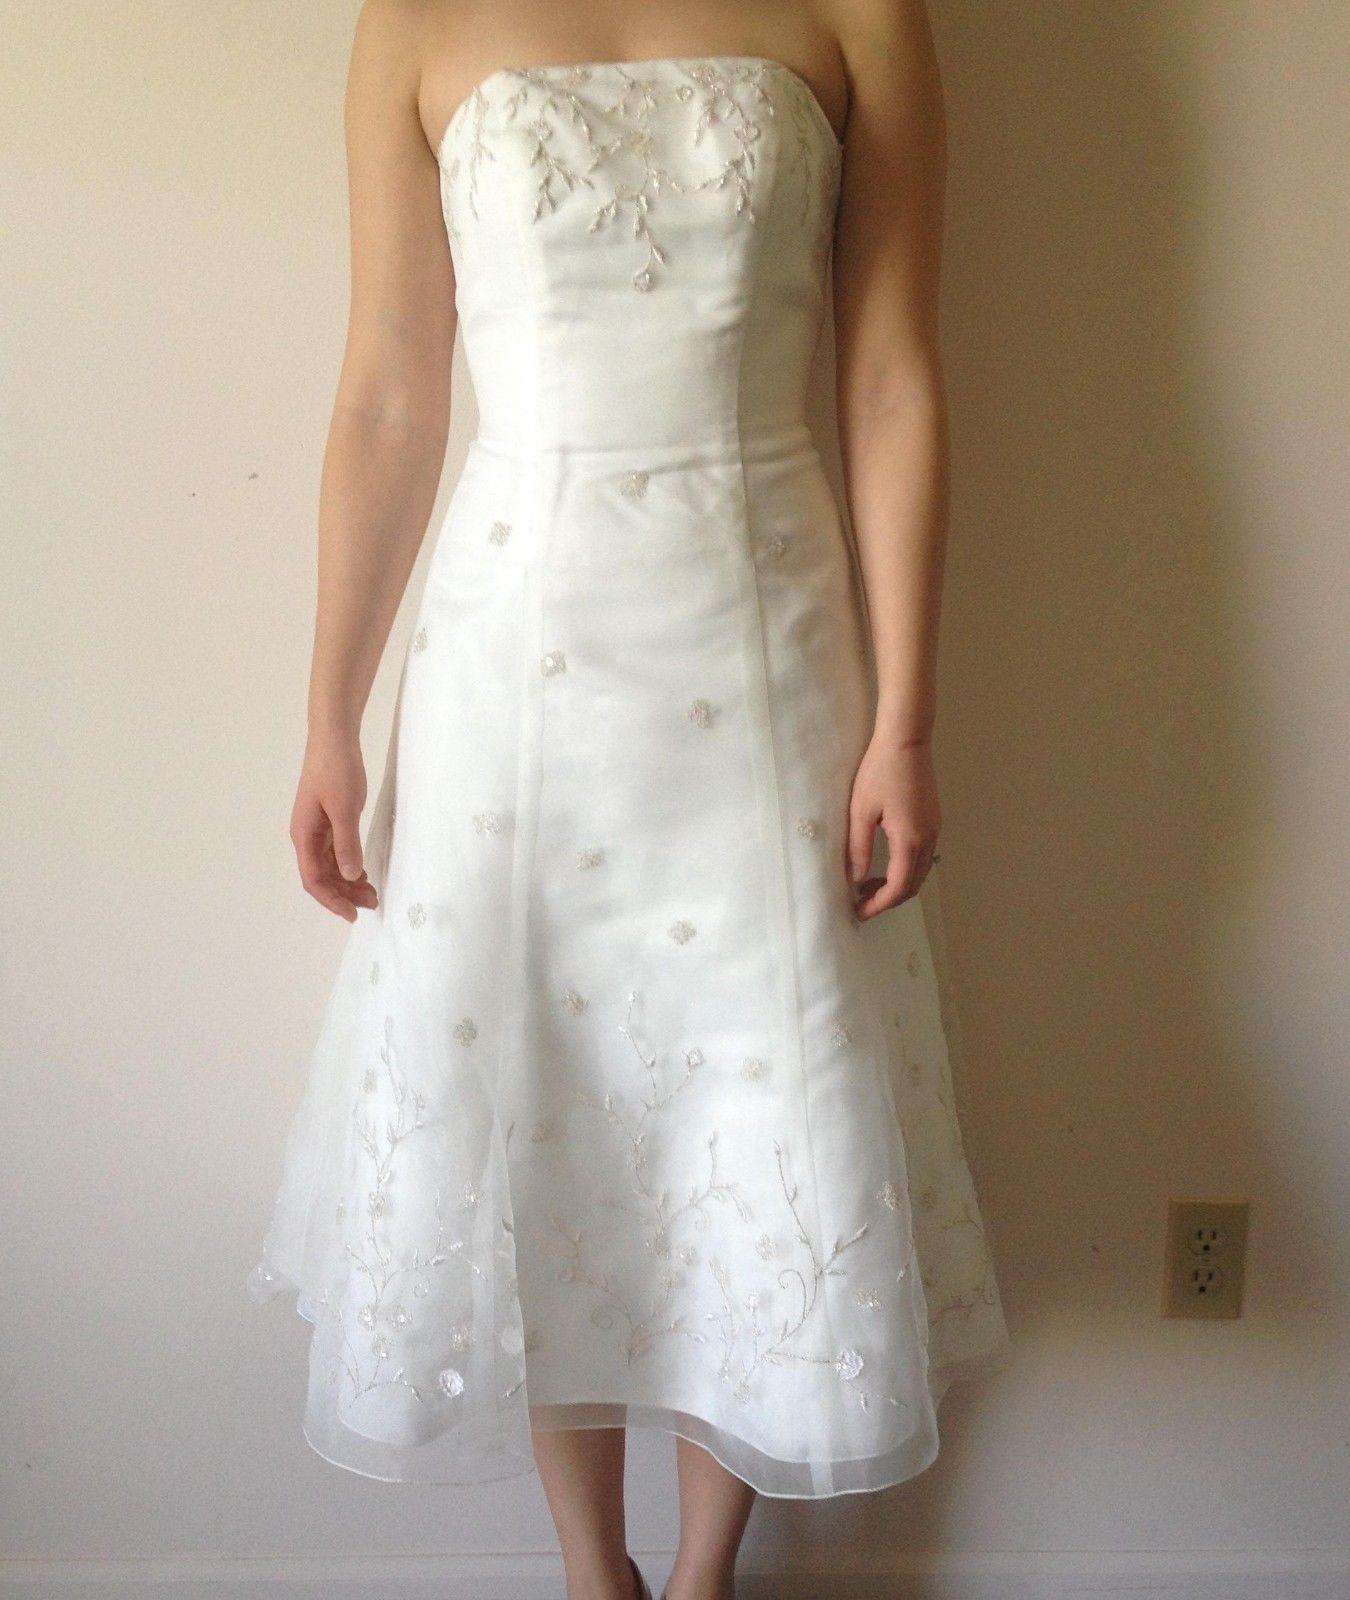 Galina Wedding Dress White Davids Bridal Vw8897 Size 14 New With Tags Destination Wedding Dress Tea Length Wedding Dress Simple Wedding Gowns [ 1600 x 1350 Pixel ]